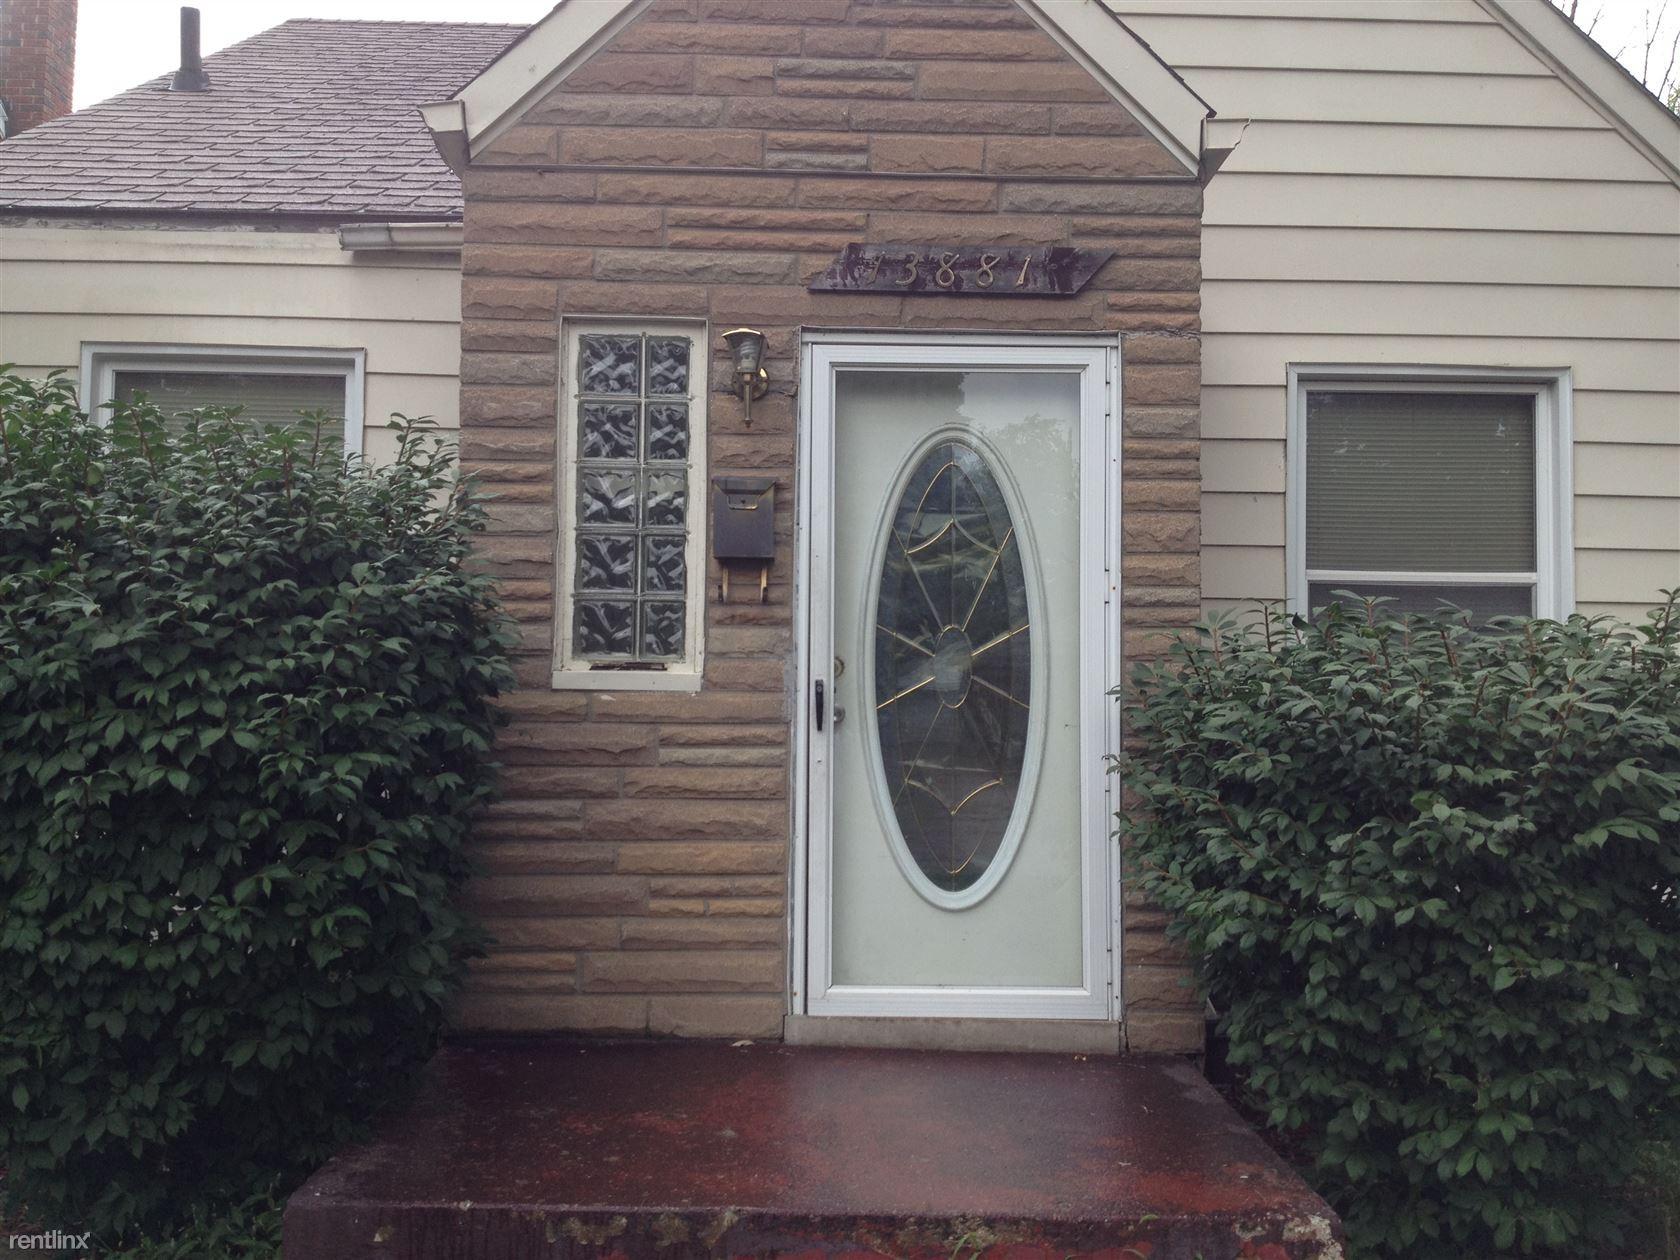 13881 carlisle st detroit mi 48205 3 bedroom house for rent for 650 month zumper